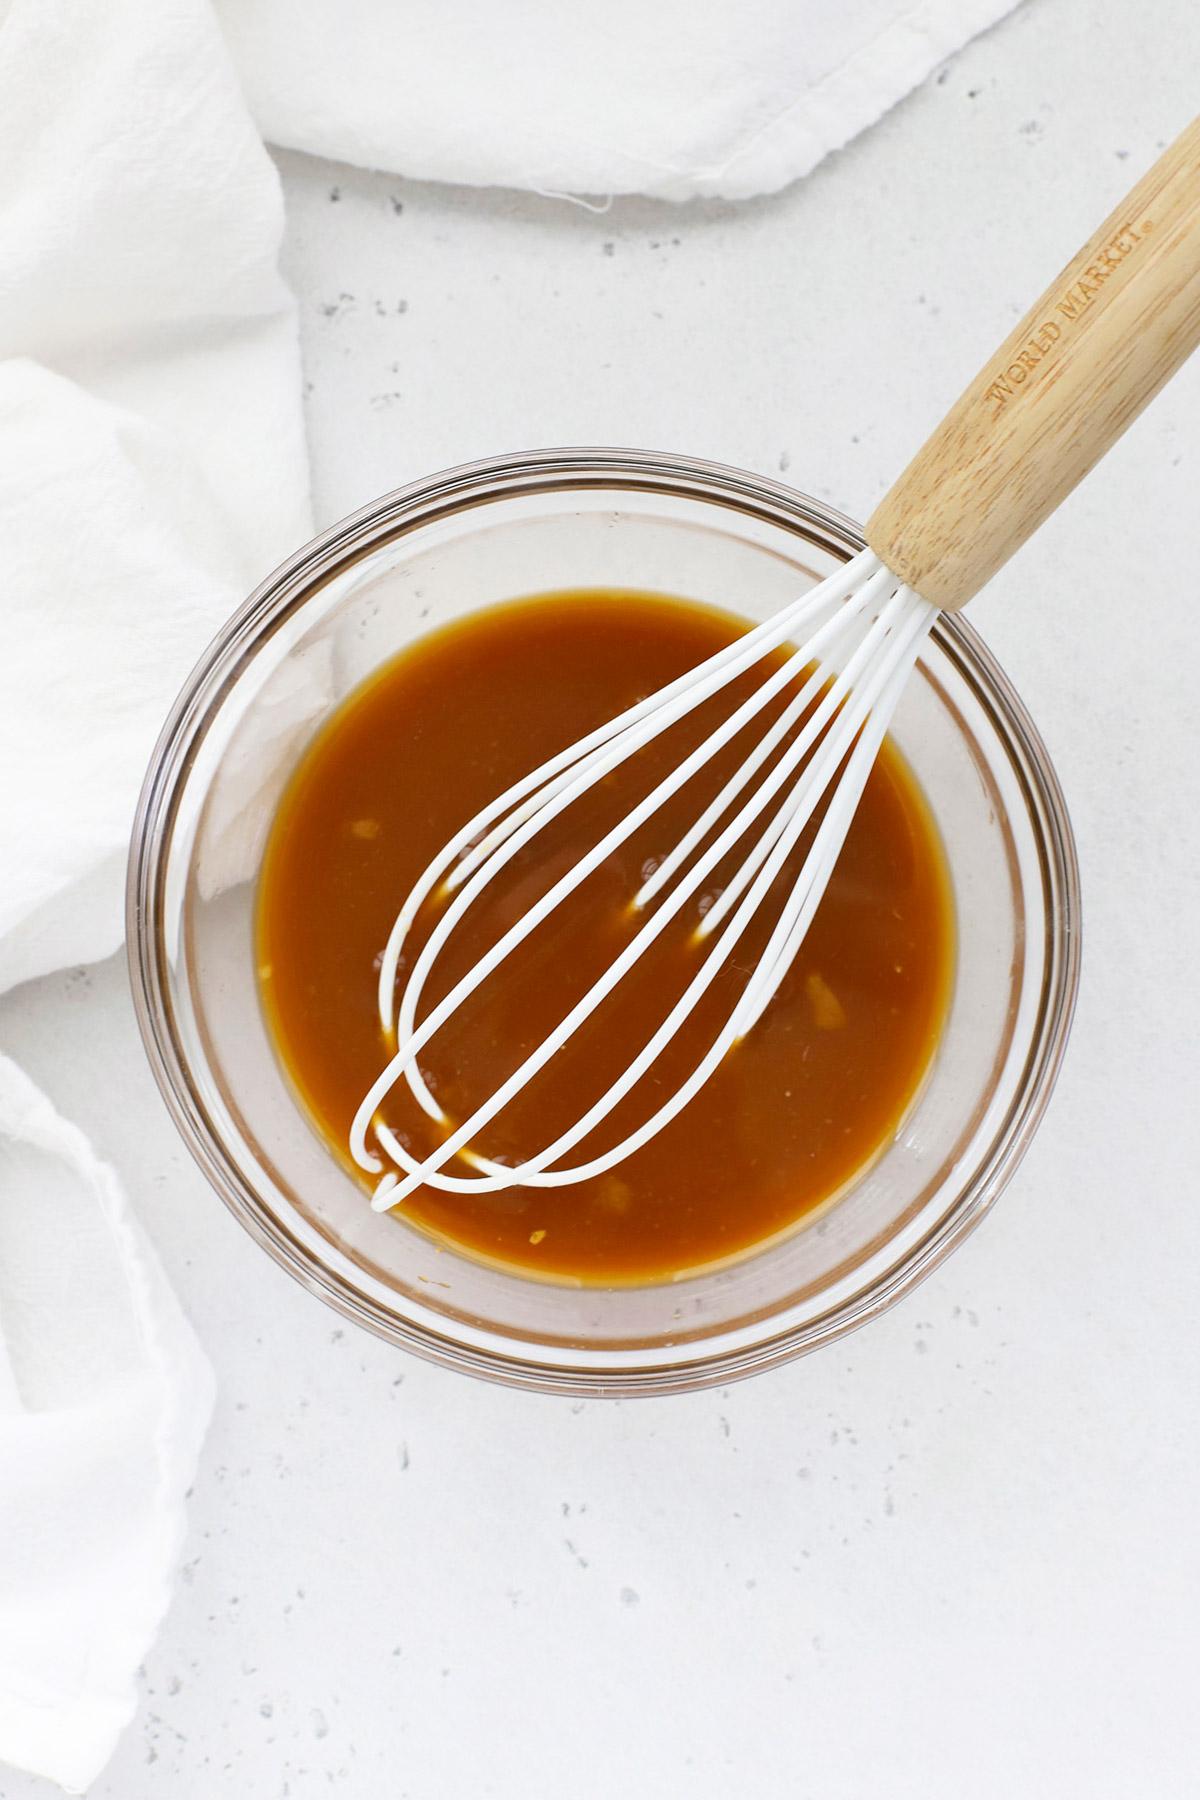 Overhead view of orange chicken stir fry sauce